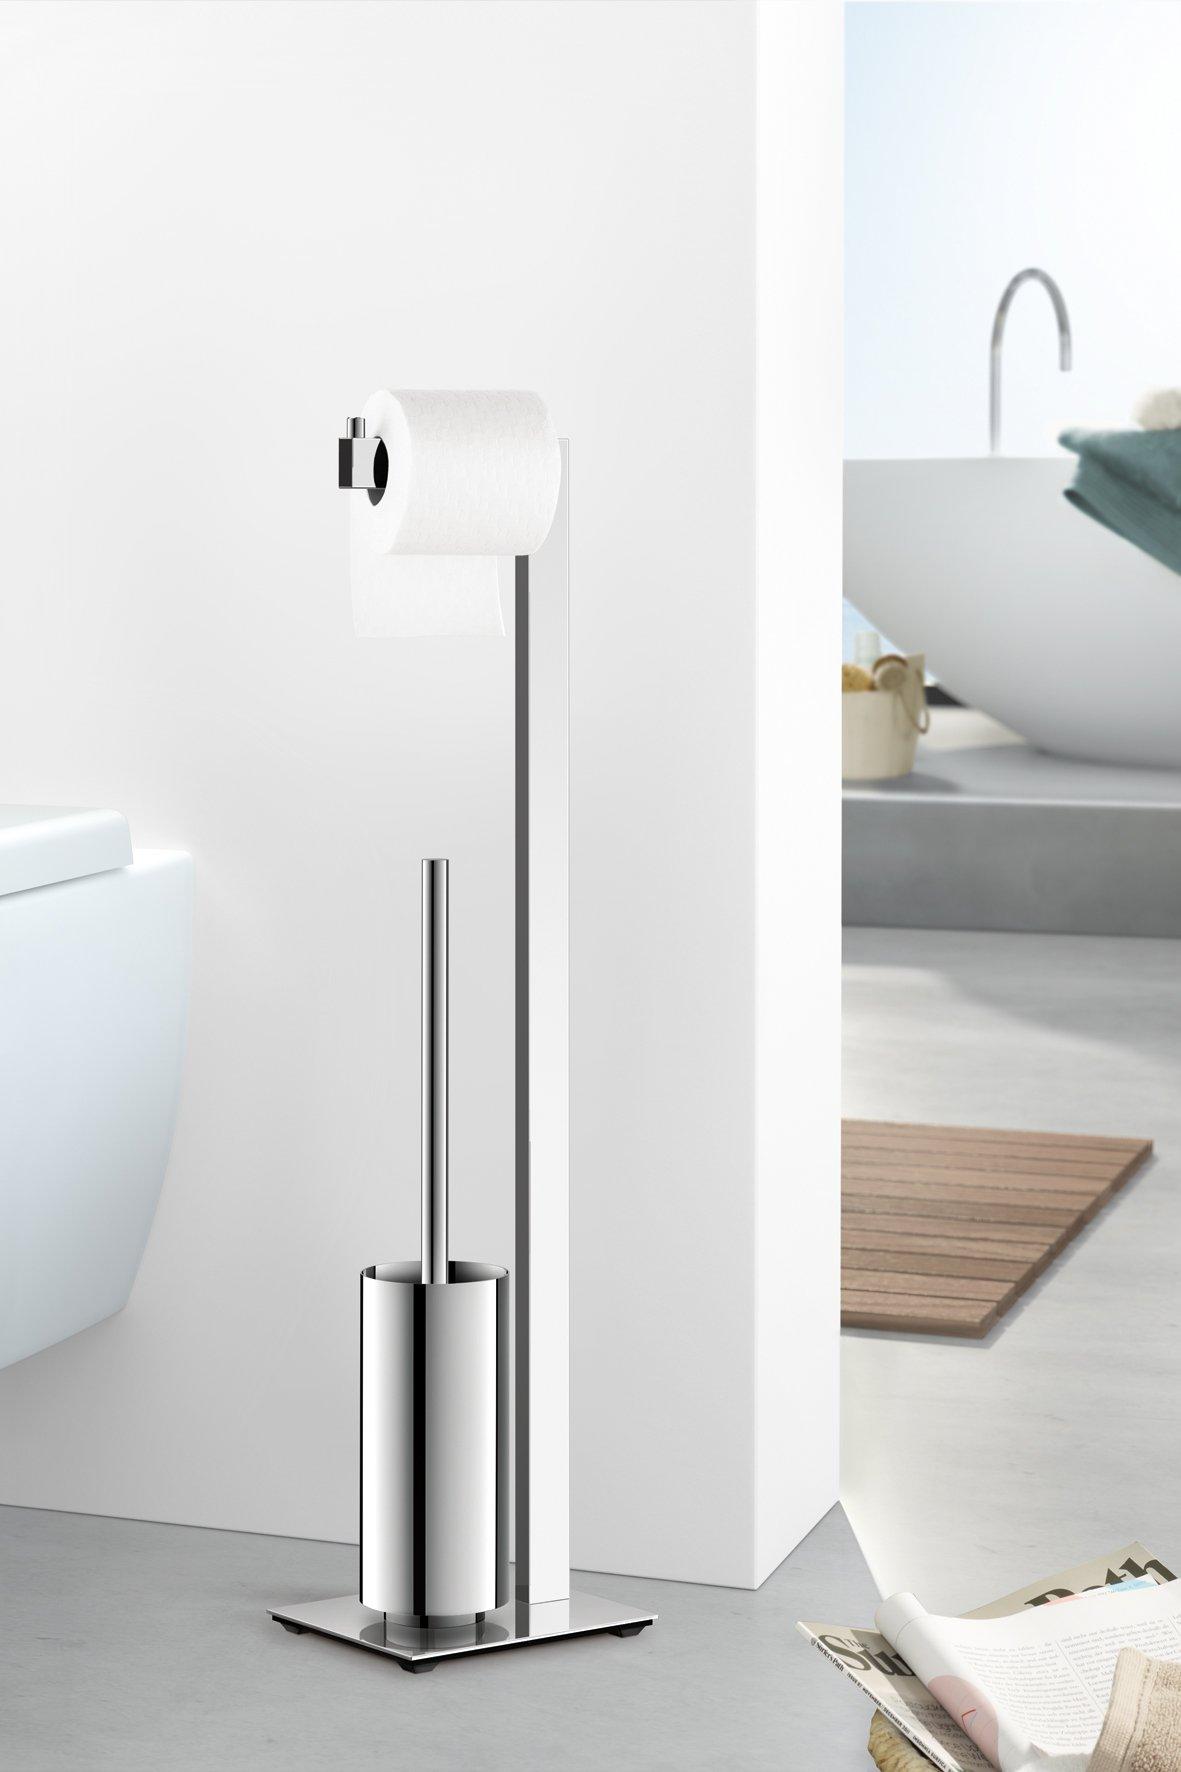 Zack 40027 Linea Toilet Butler Brush, 28.54-Inch, Grey, High Glossy Finish by Zack (Image #3)